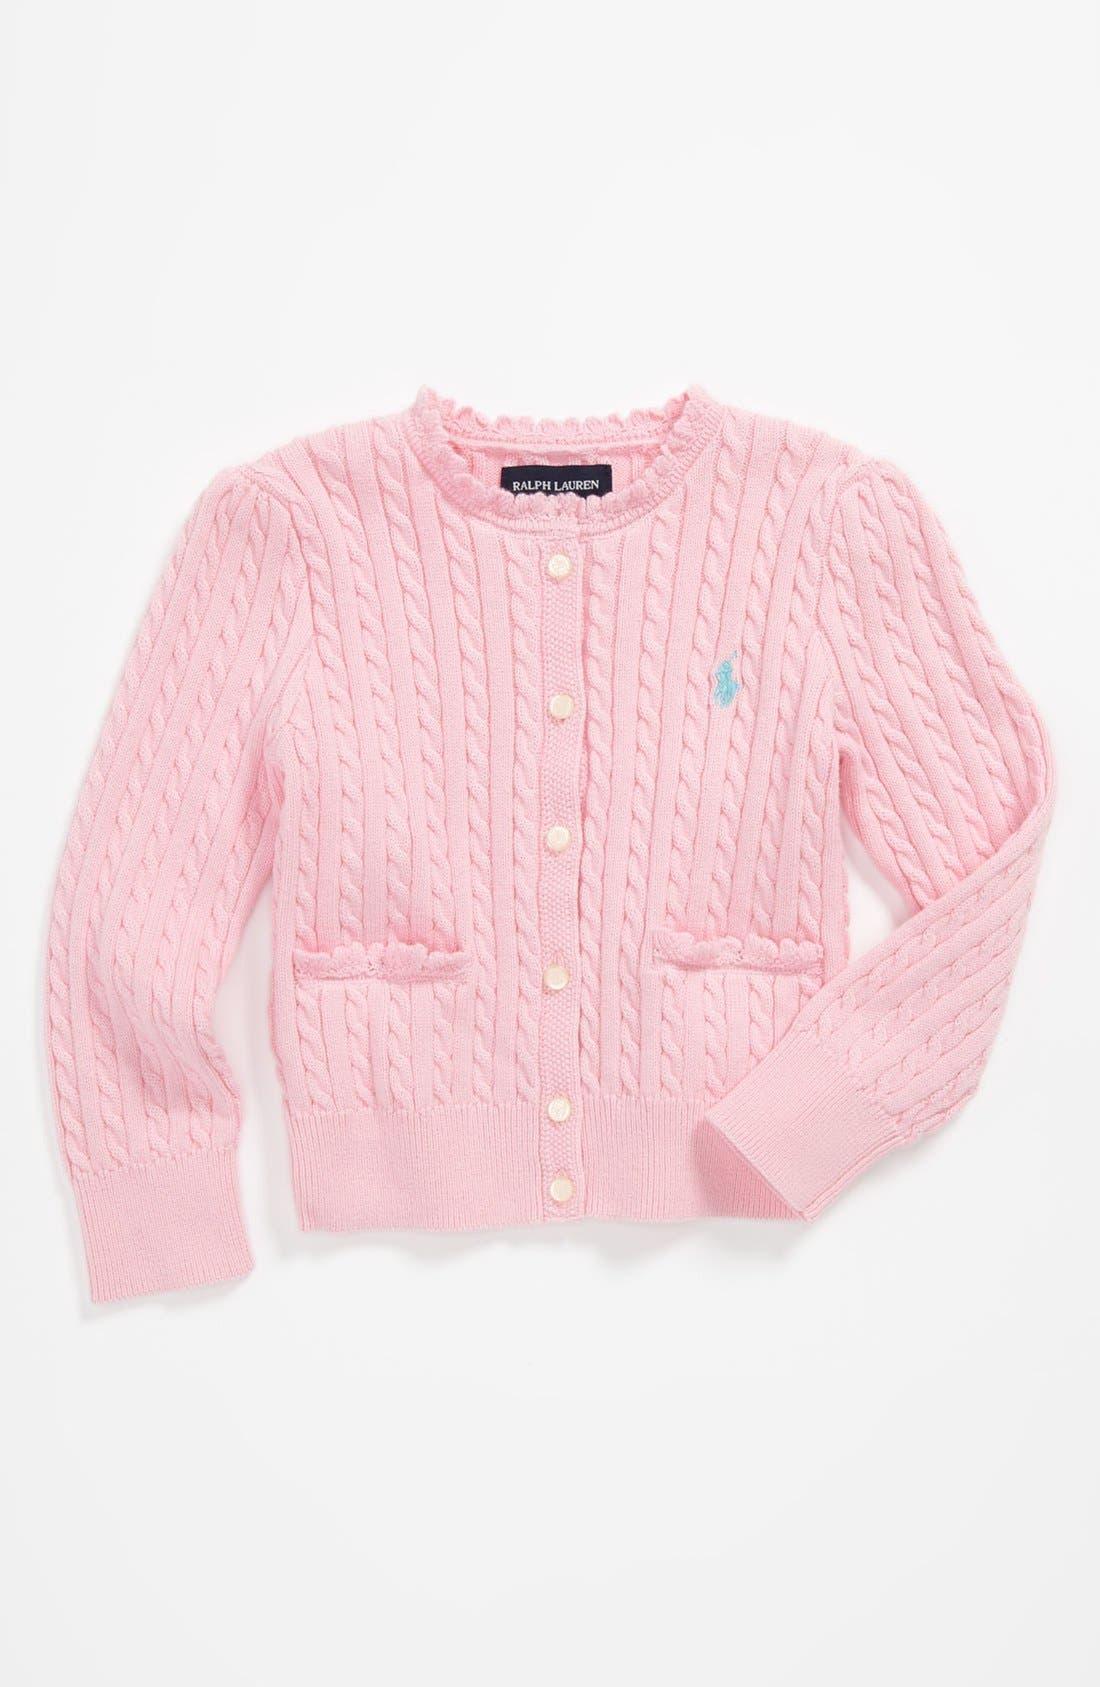 Main Image - Ralph Lauren Cable Knit Cardigan (Toddler)